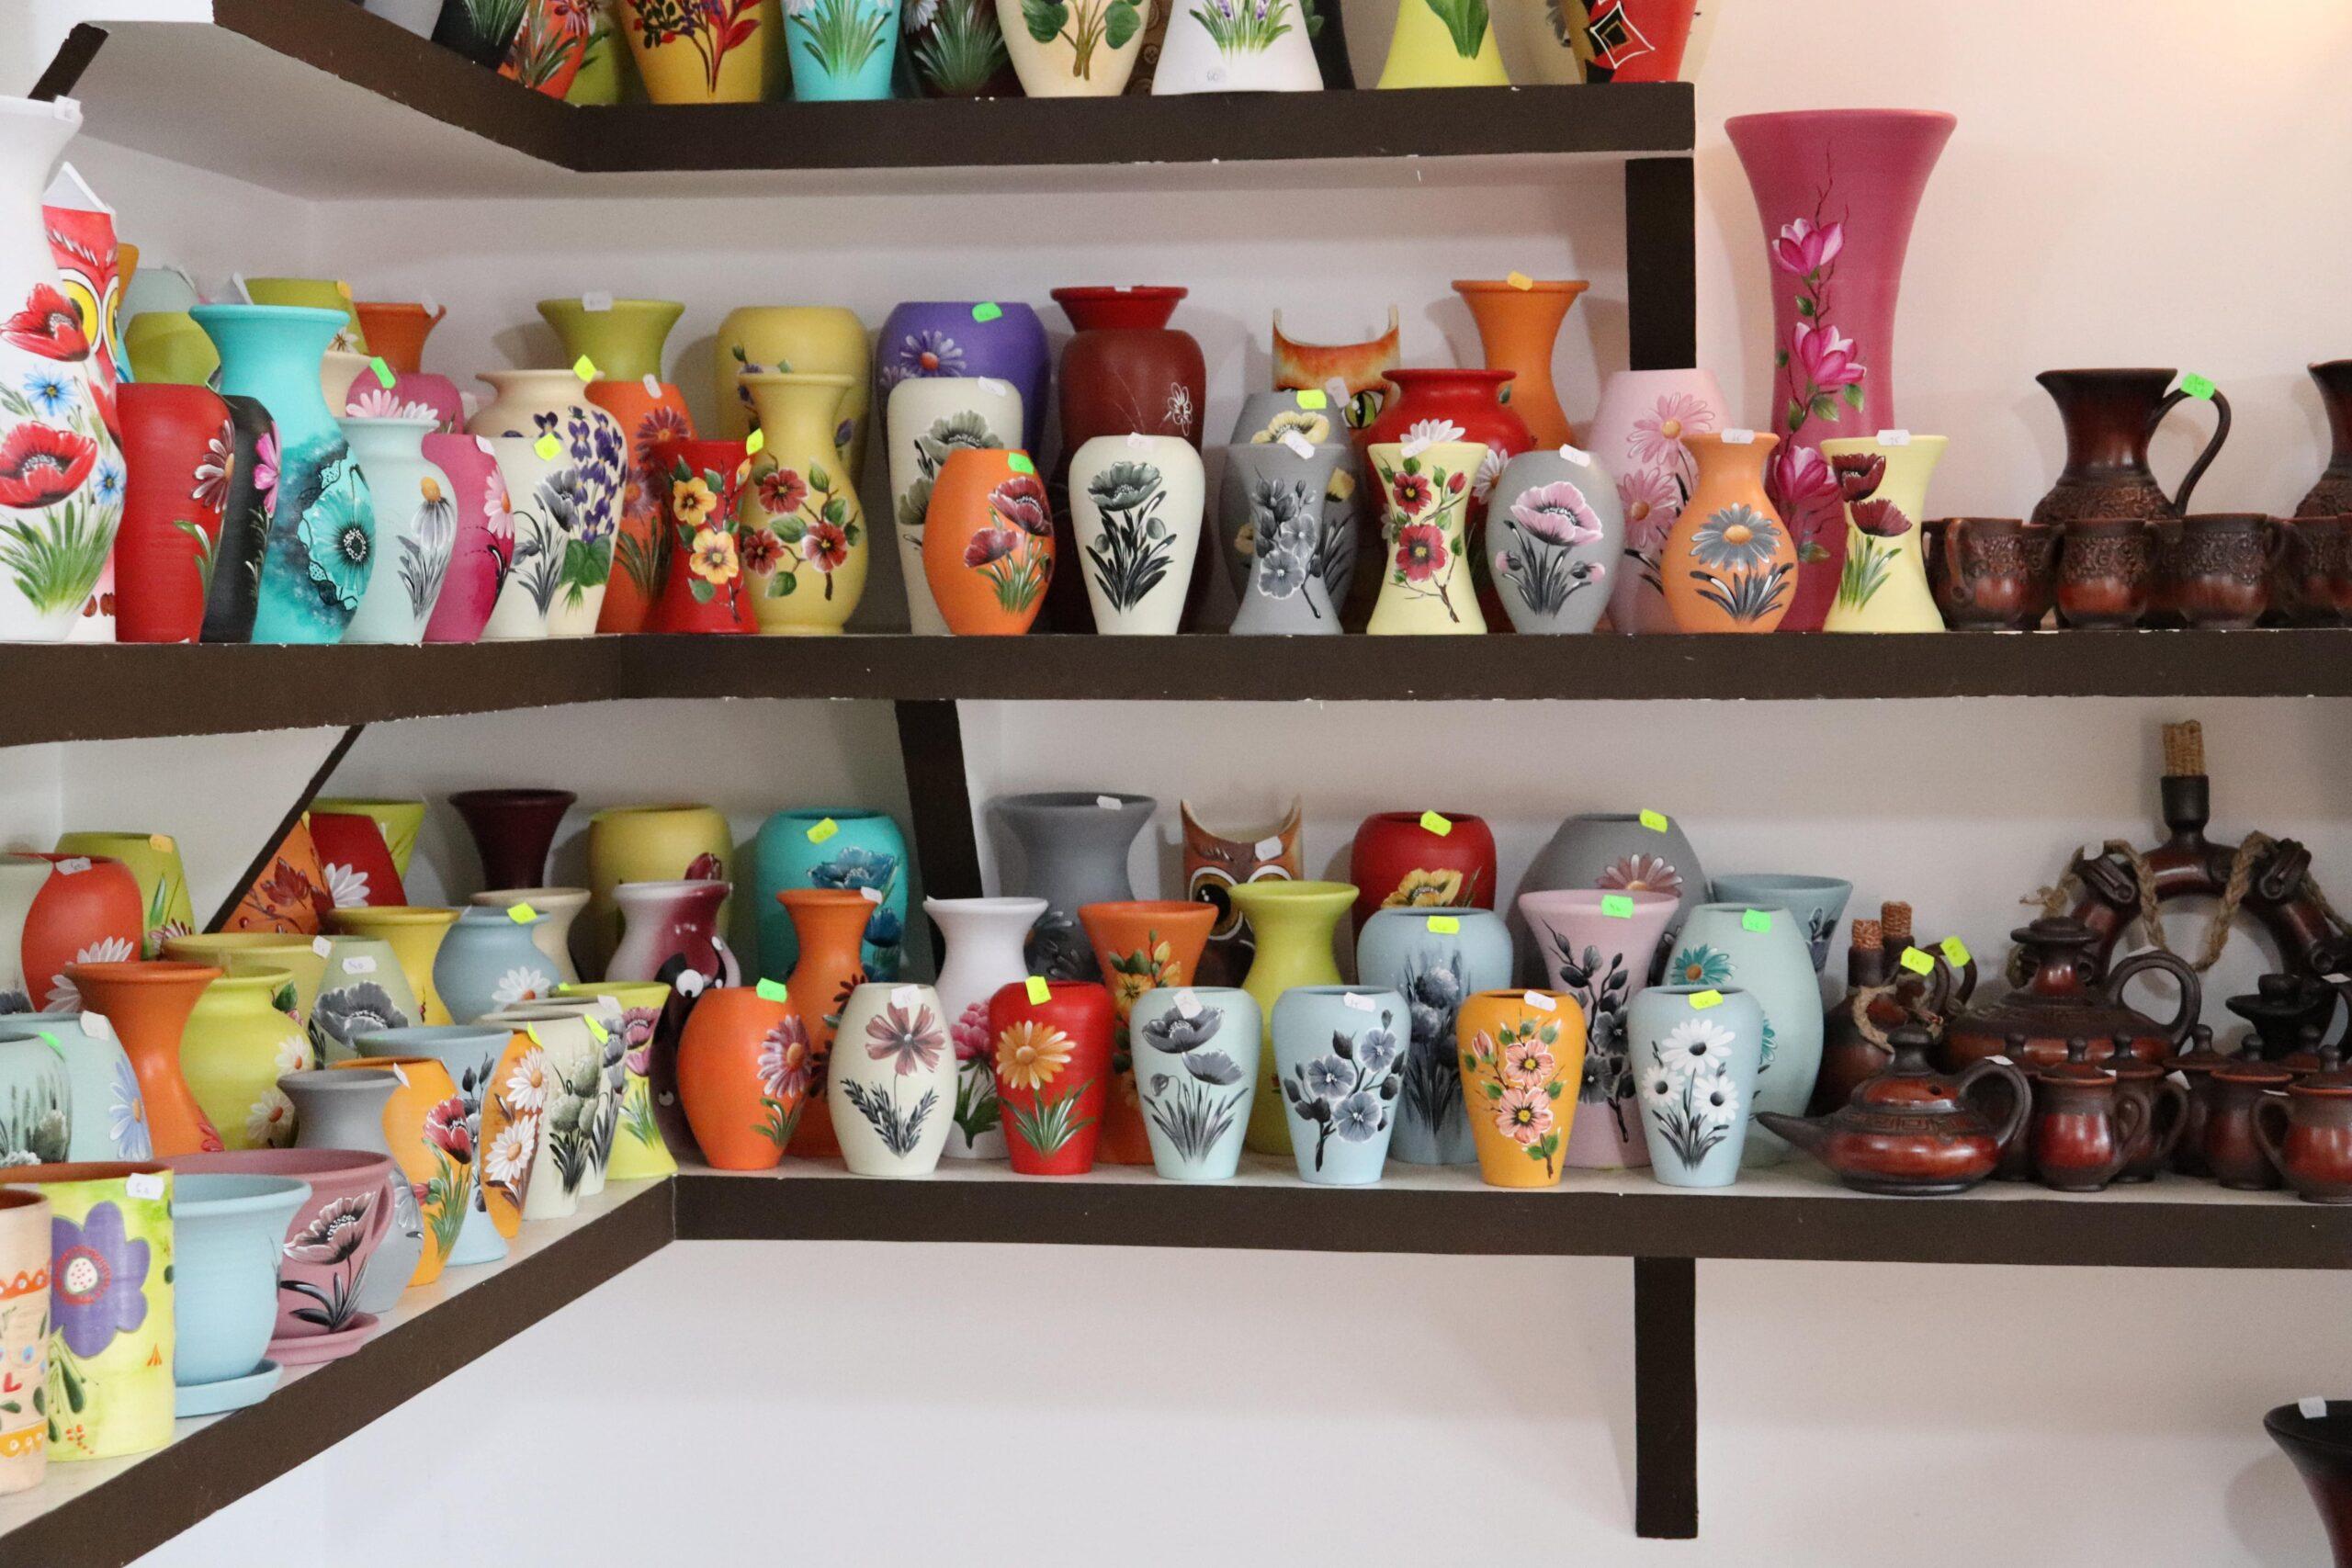 day-trip-horezu-gallery-vaze